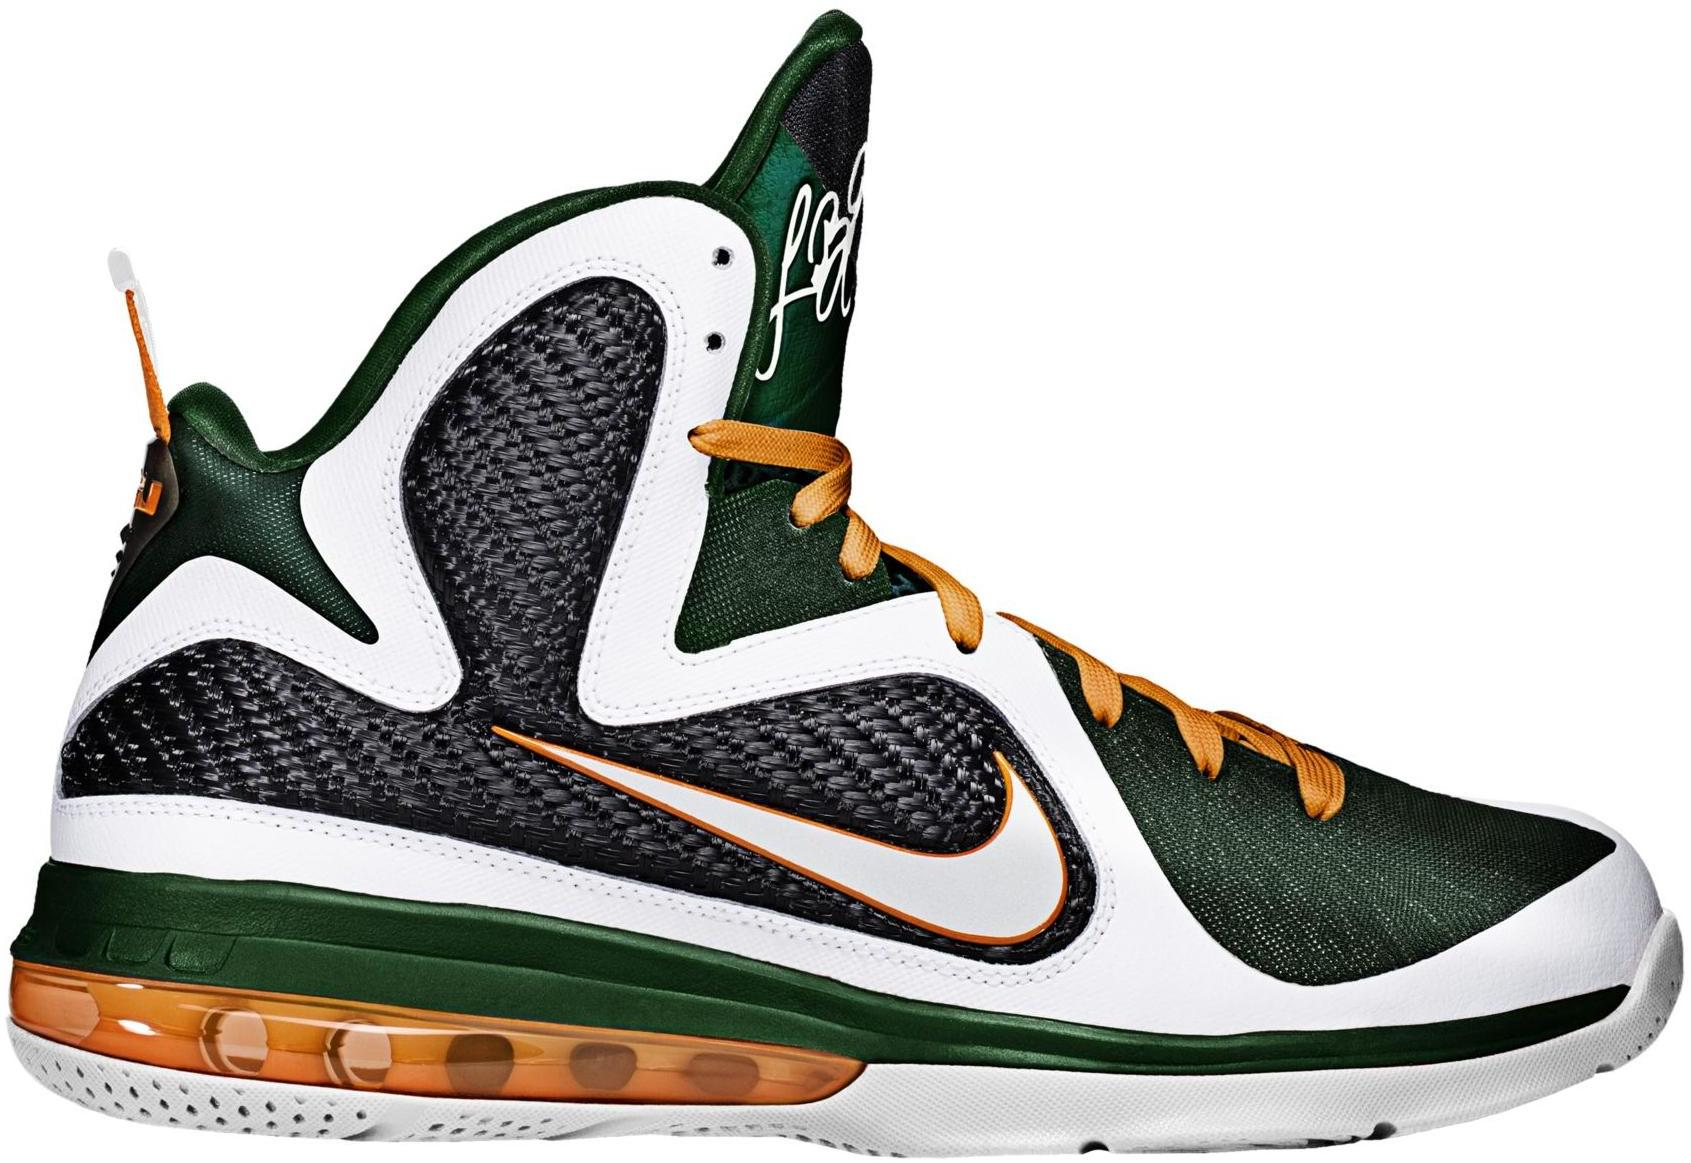 Nike LeBron 9 Miami Hurricanes - 469764-102